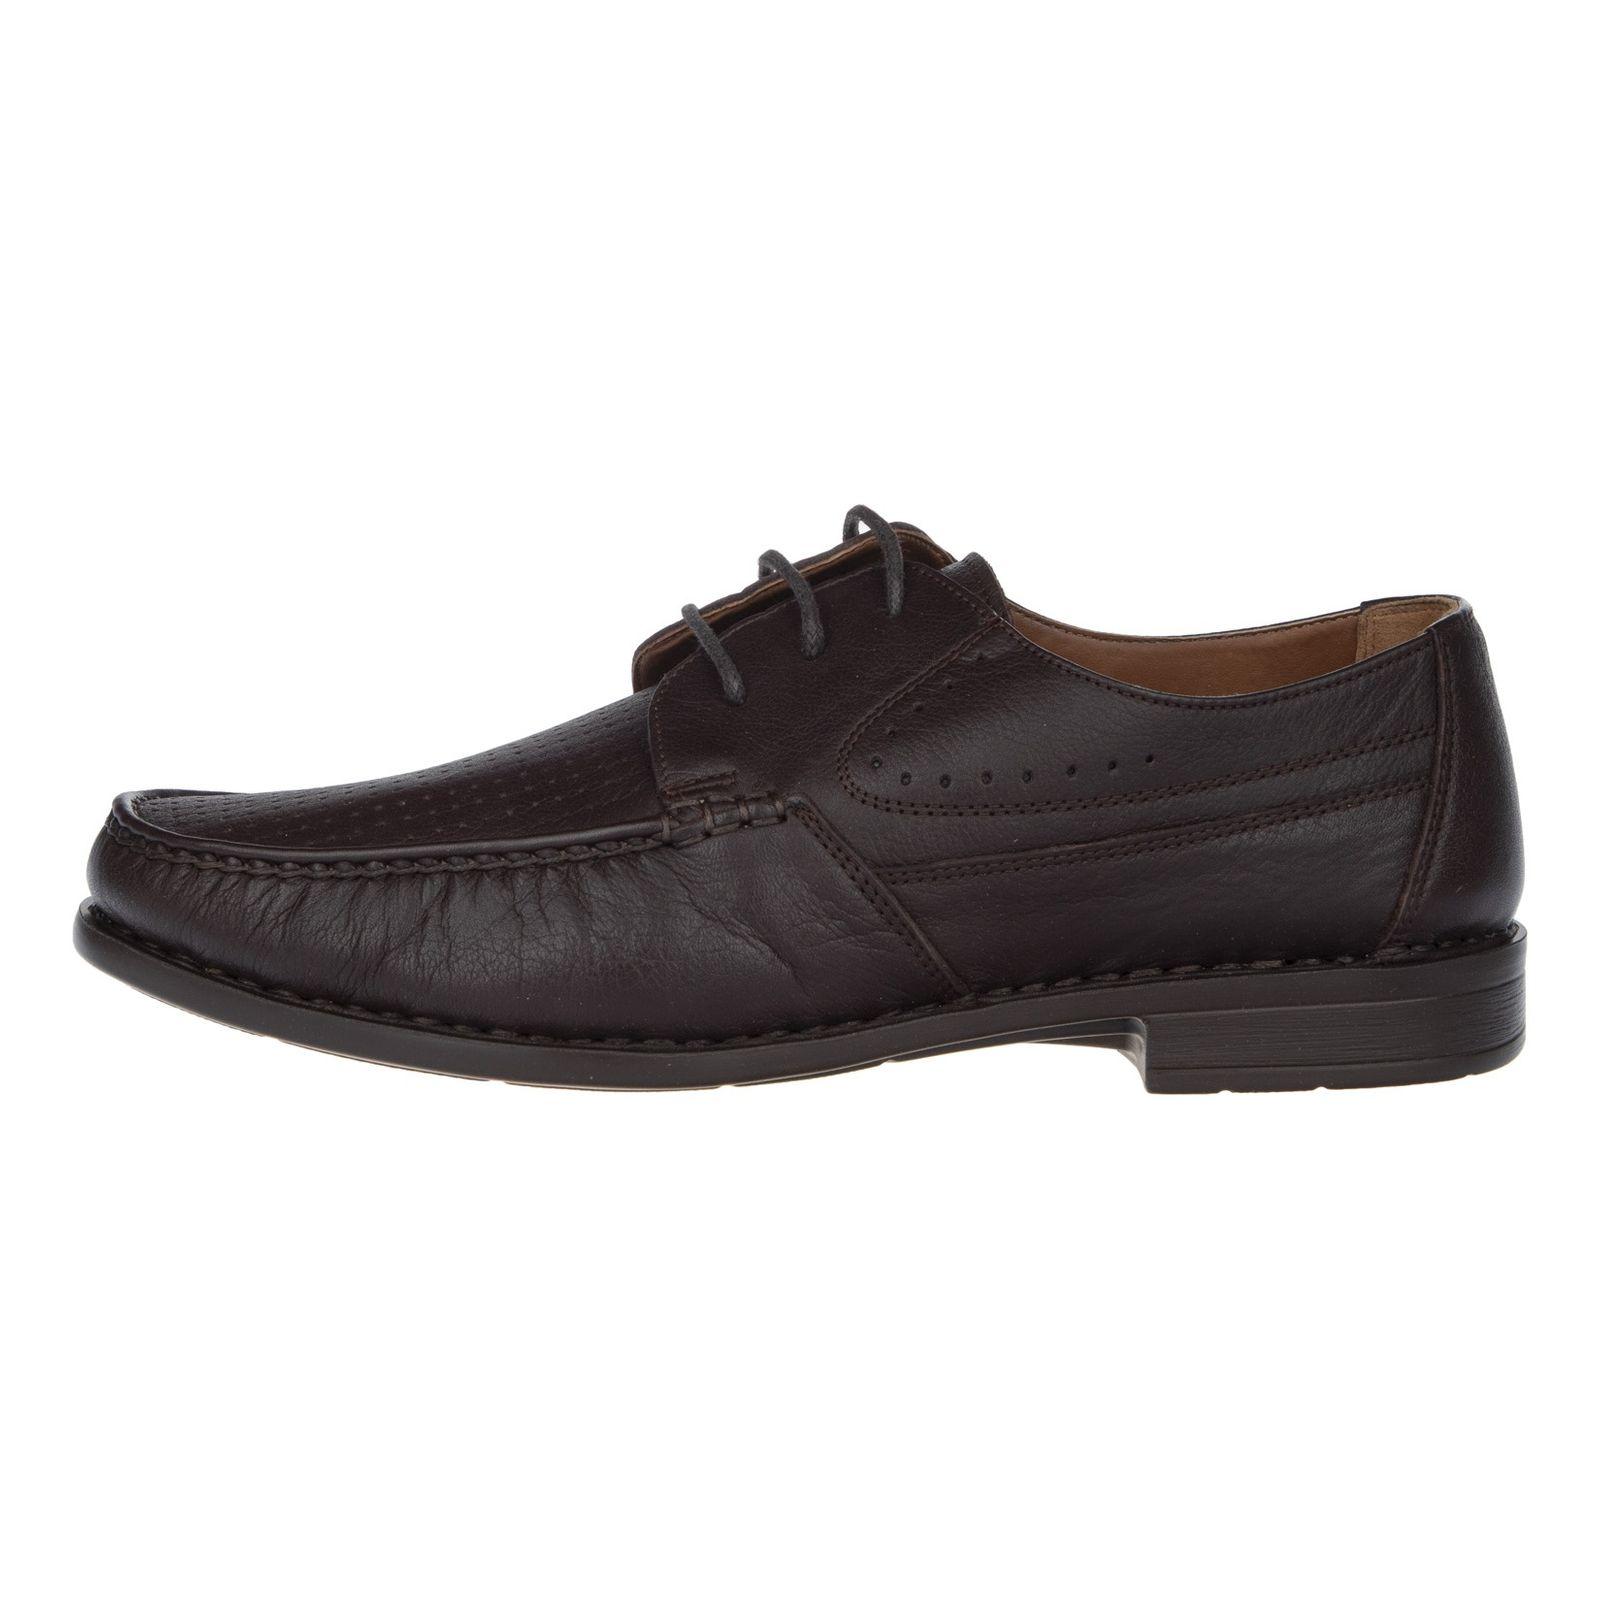 کفش روزمره مردانه پولاریس مدل 100296904-103 - قهوه ای - 3